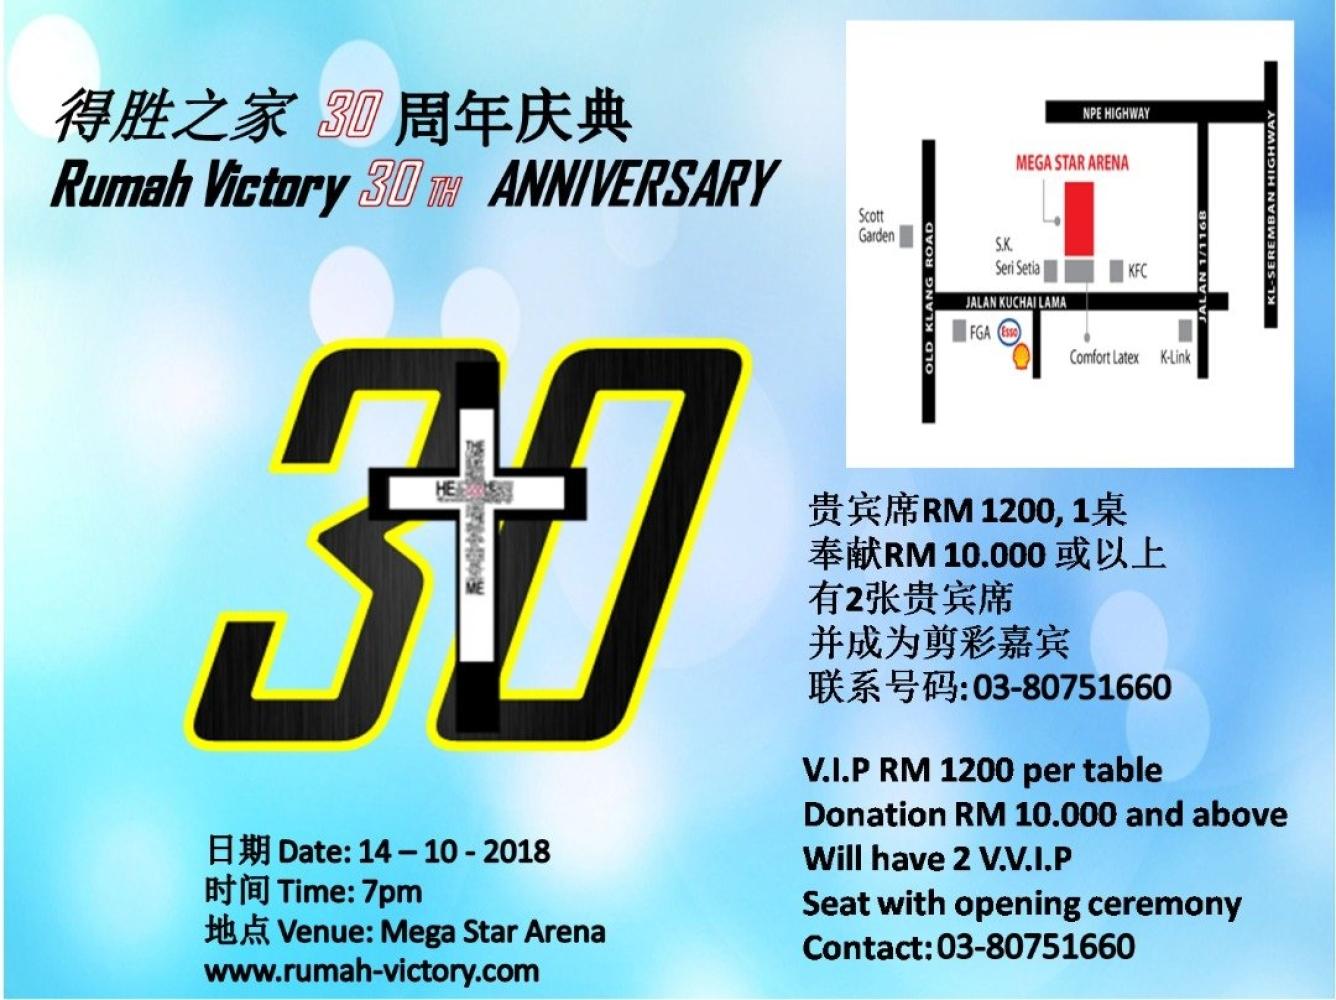 Rumah Victory 30th Anniversary